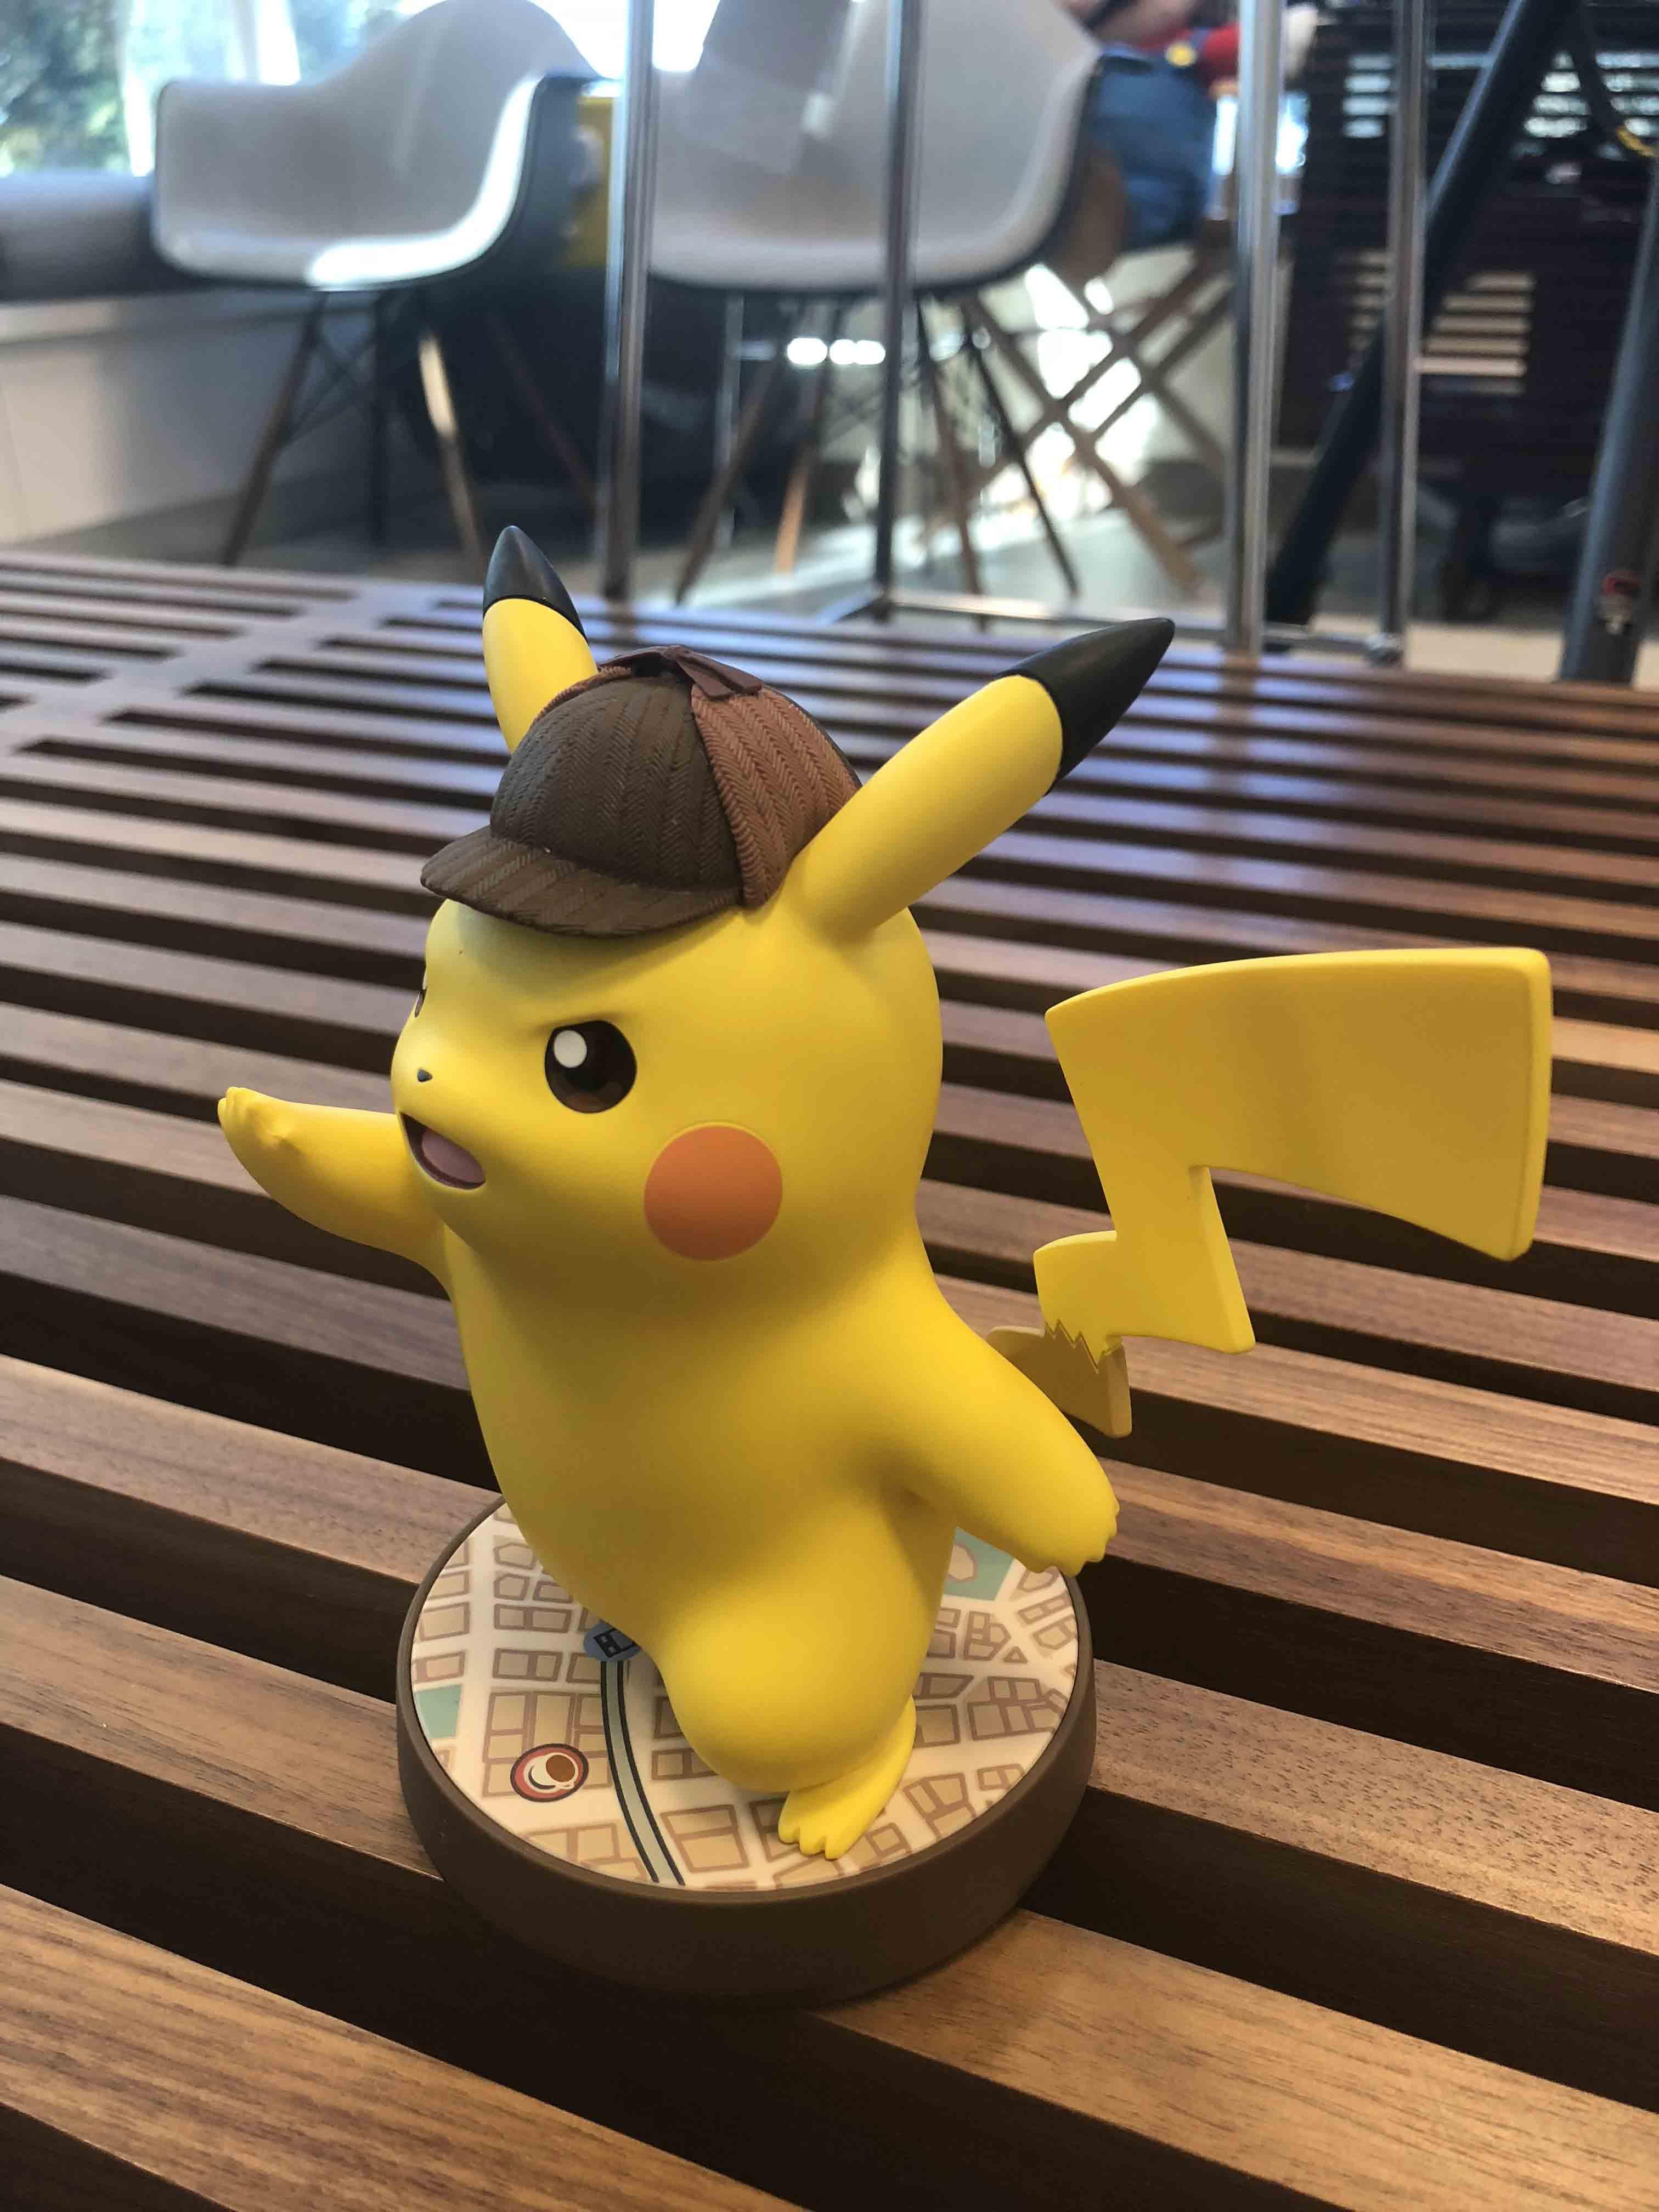 New Photos Of The Detective Pikachu Amiibo Nintendo Everything